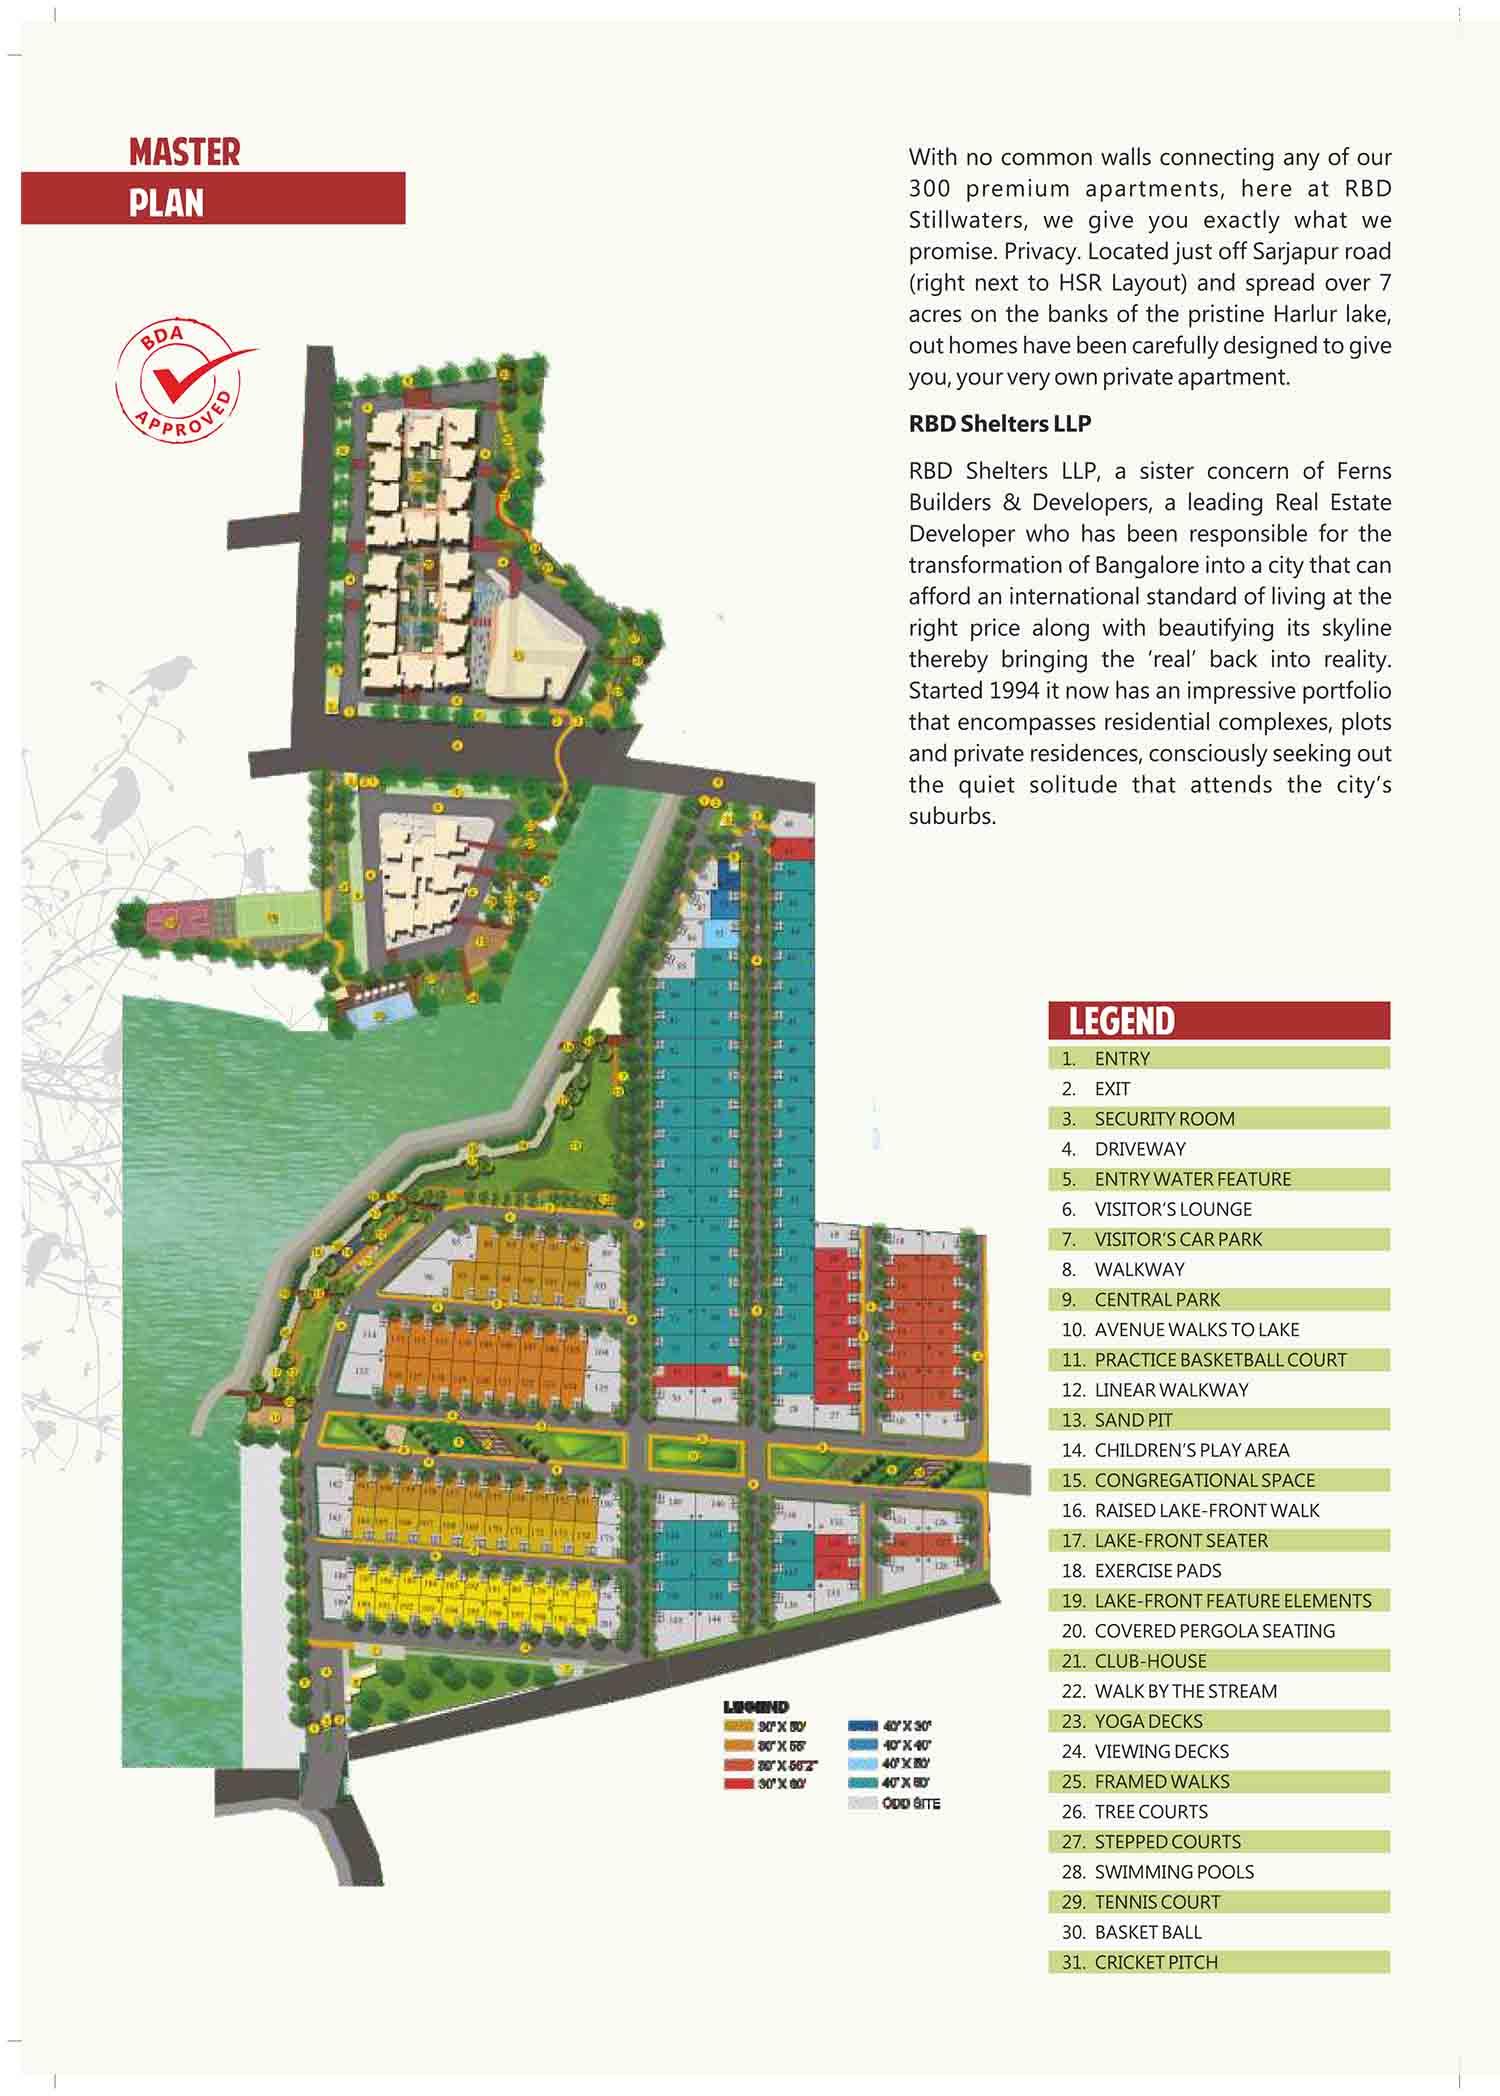 RBD Stillwaters Apartments Sarjapur Road Bangalore 14641